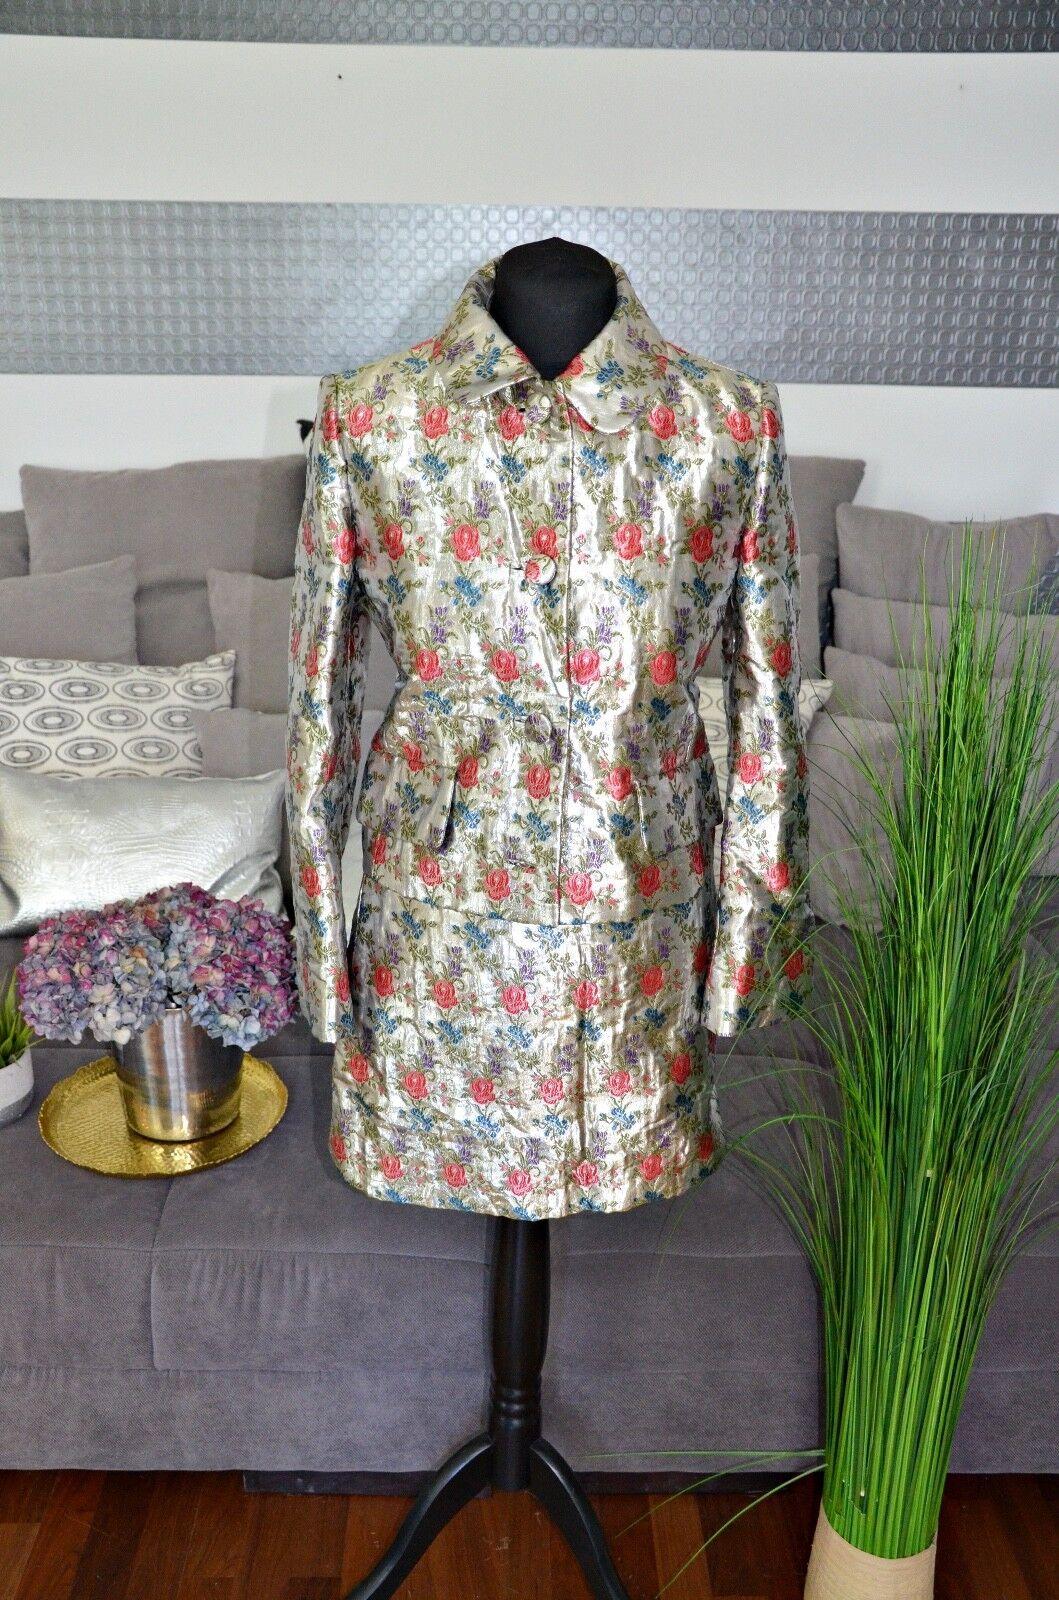 Miu Miu Blazer et Jupe size 40 Floral-Metallic comme Neuf